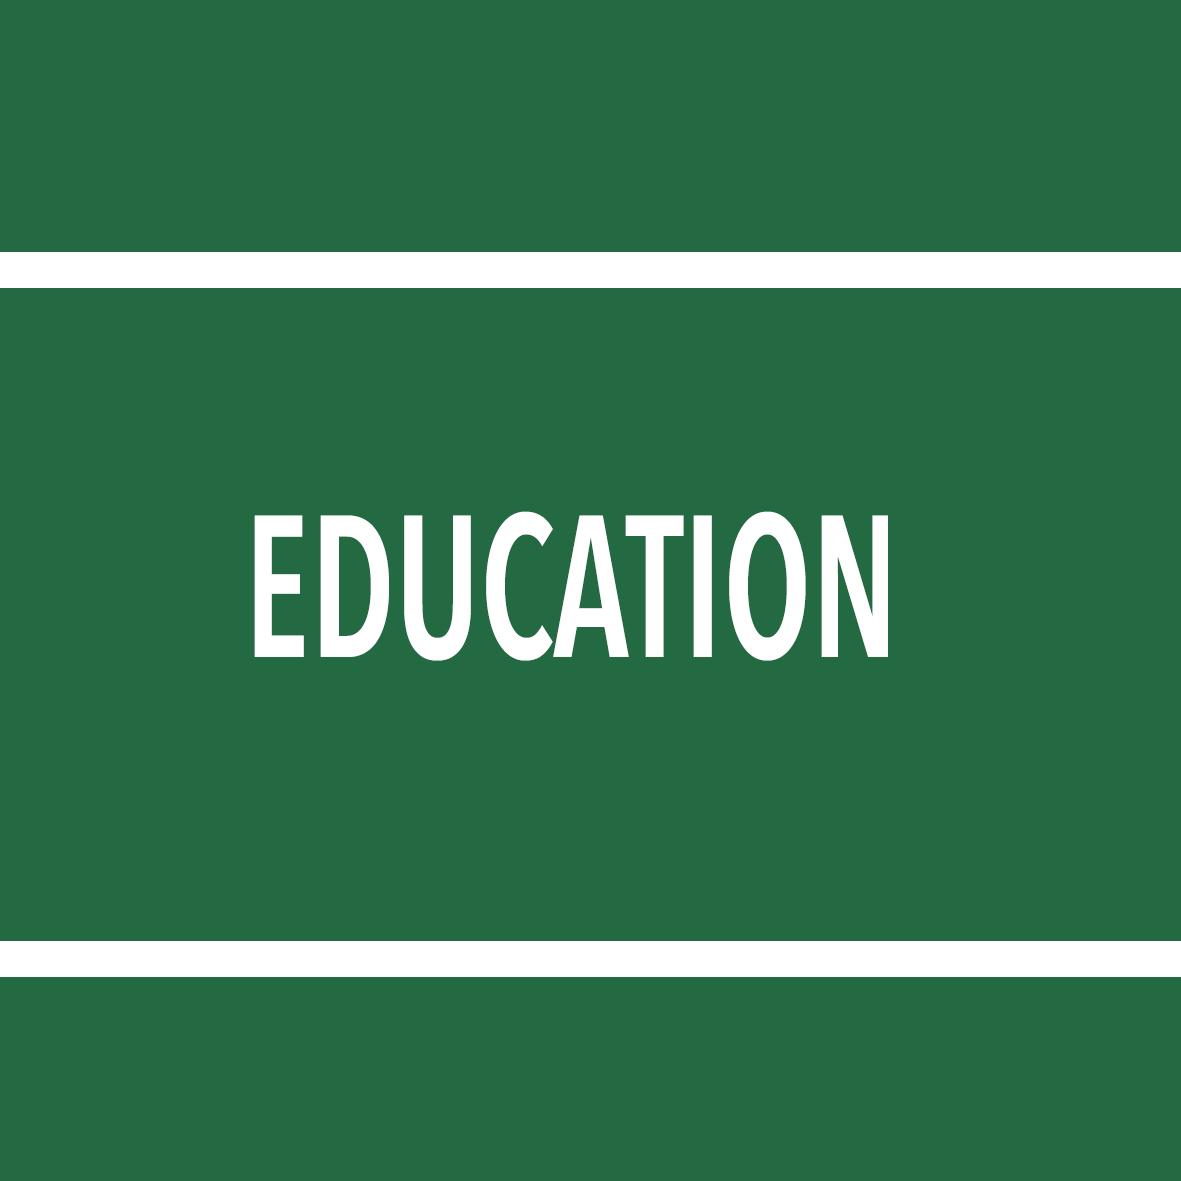 EDUCATION | UNIVERSITIES